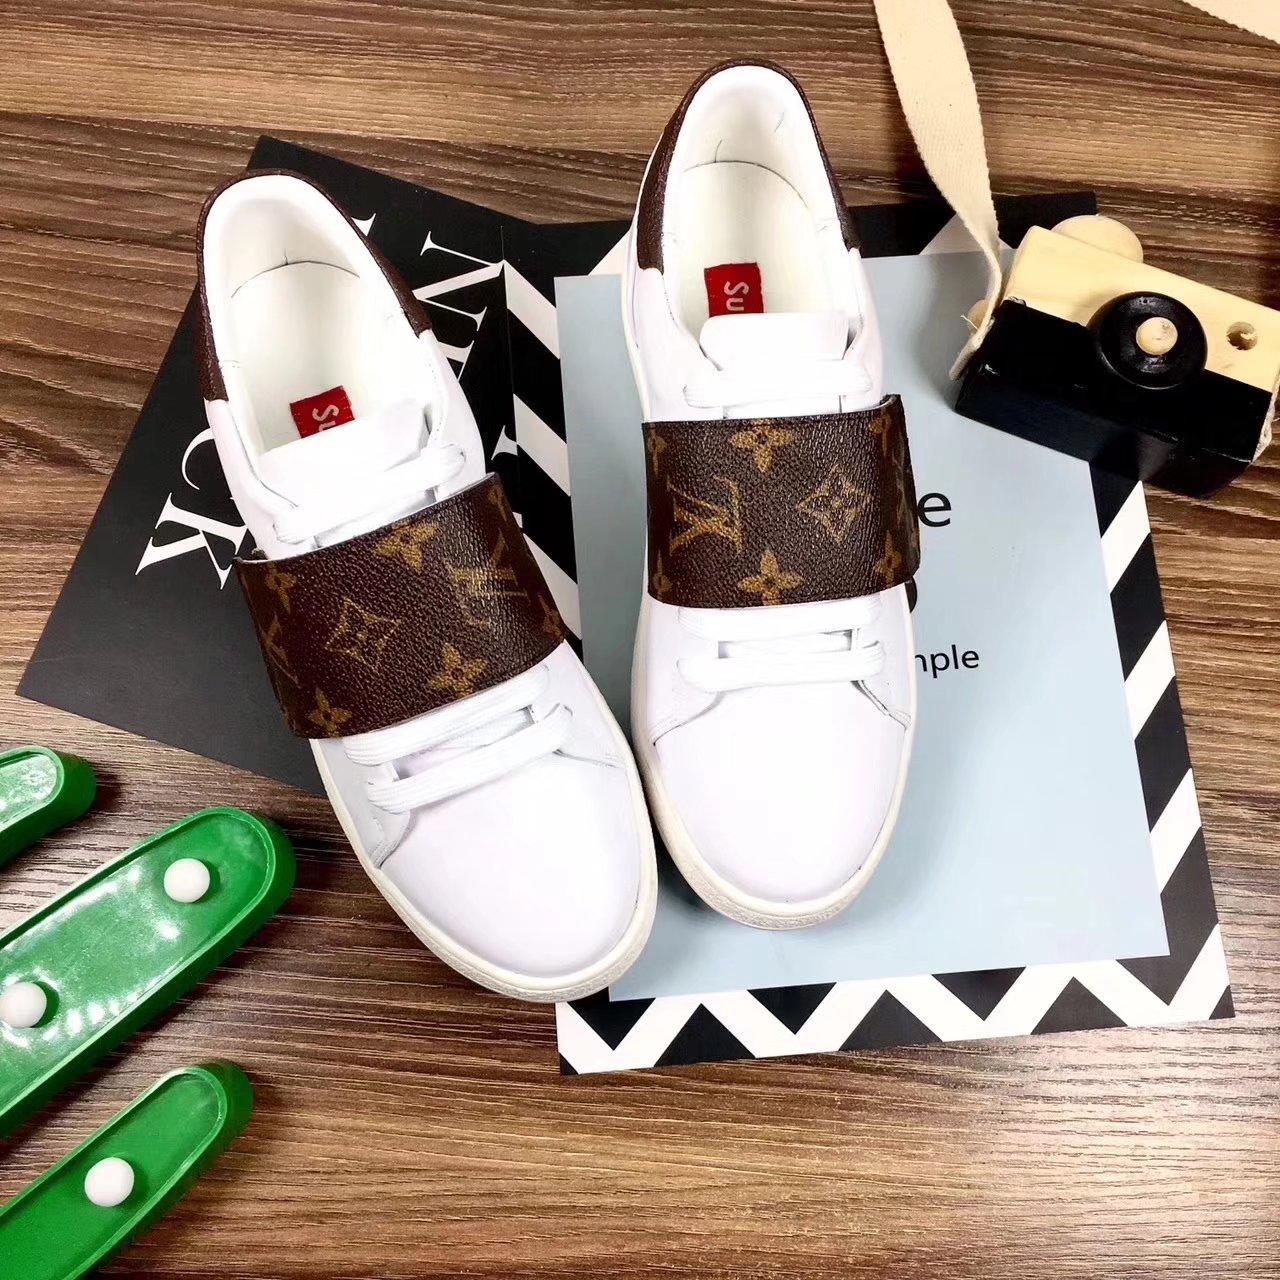 Louis vuitton shoes women - page2,louis vuitton shoes 2017 women italy  first layer cowhide e4052468cb2